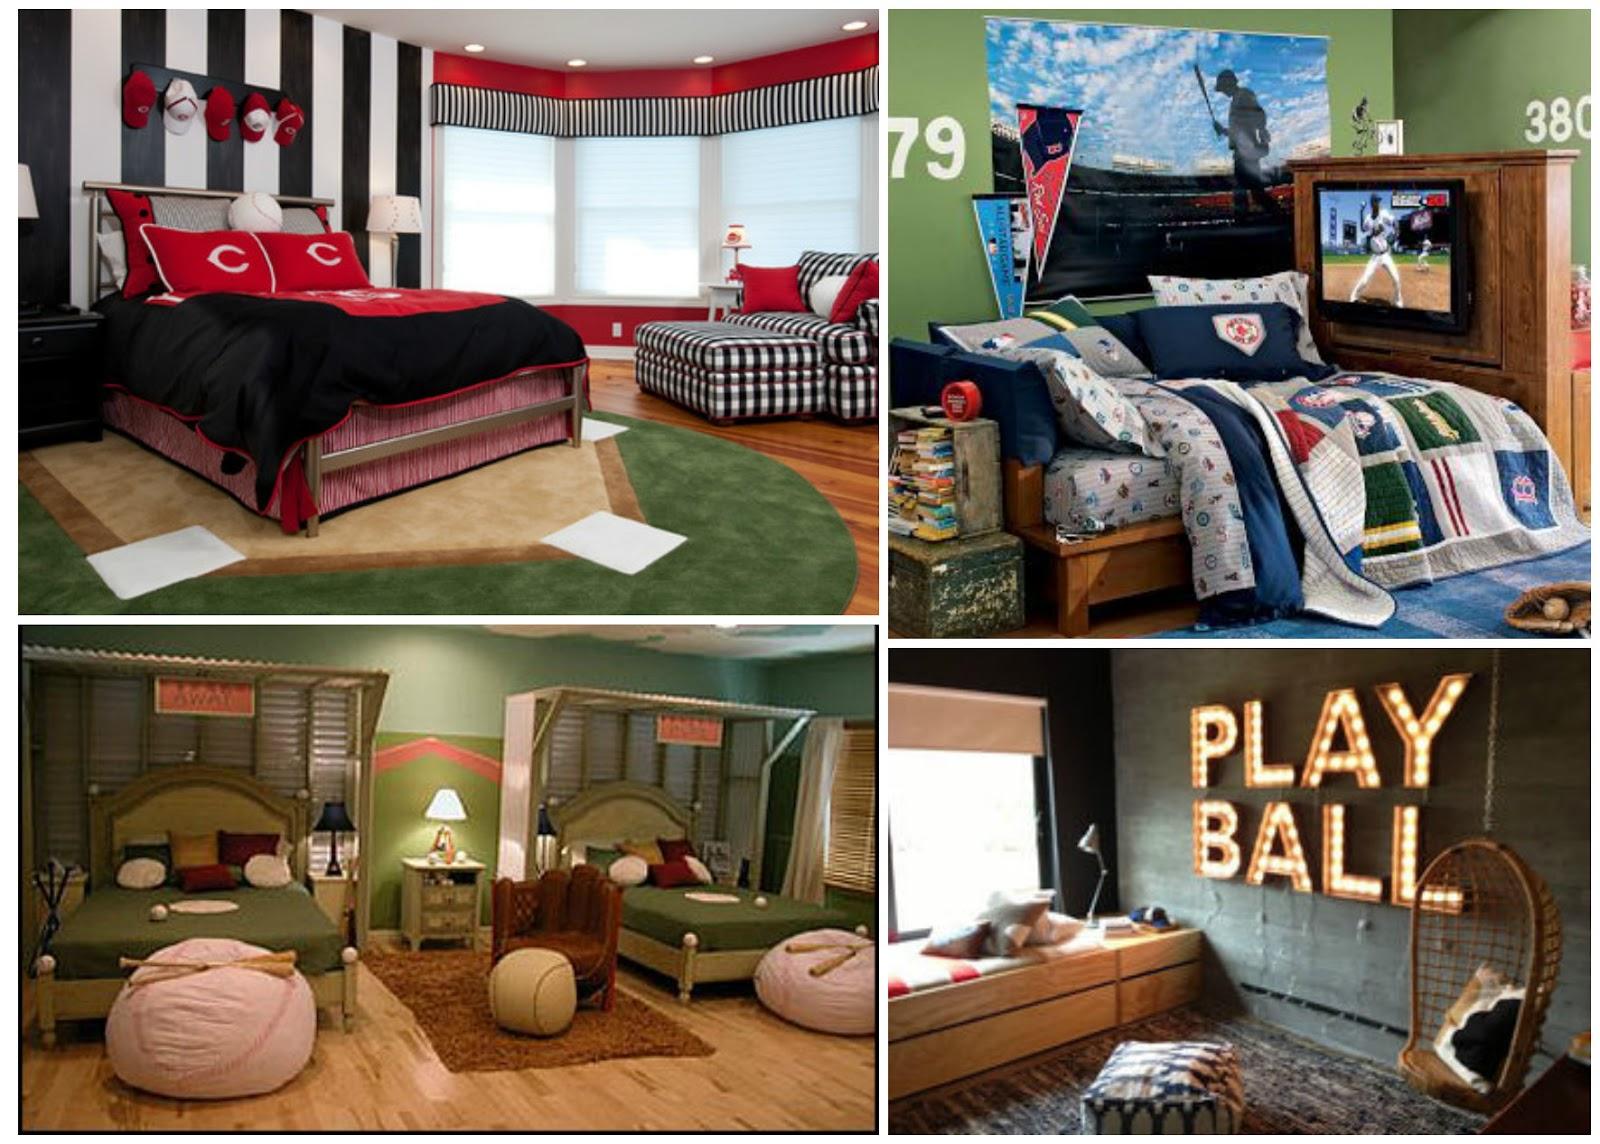 Baseball Season  In Home Design. Baseball Season  In Home Design   Home   Garden Design Ideas Articles